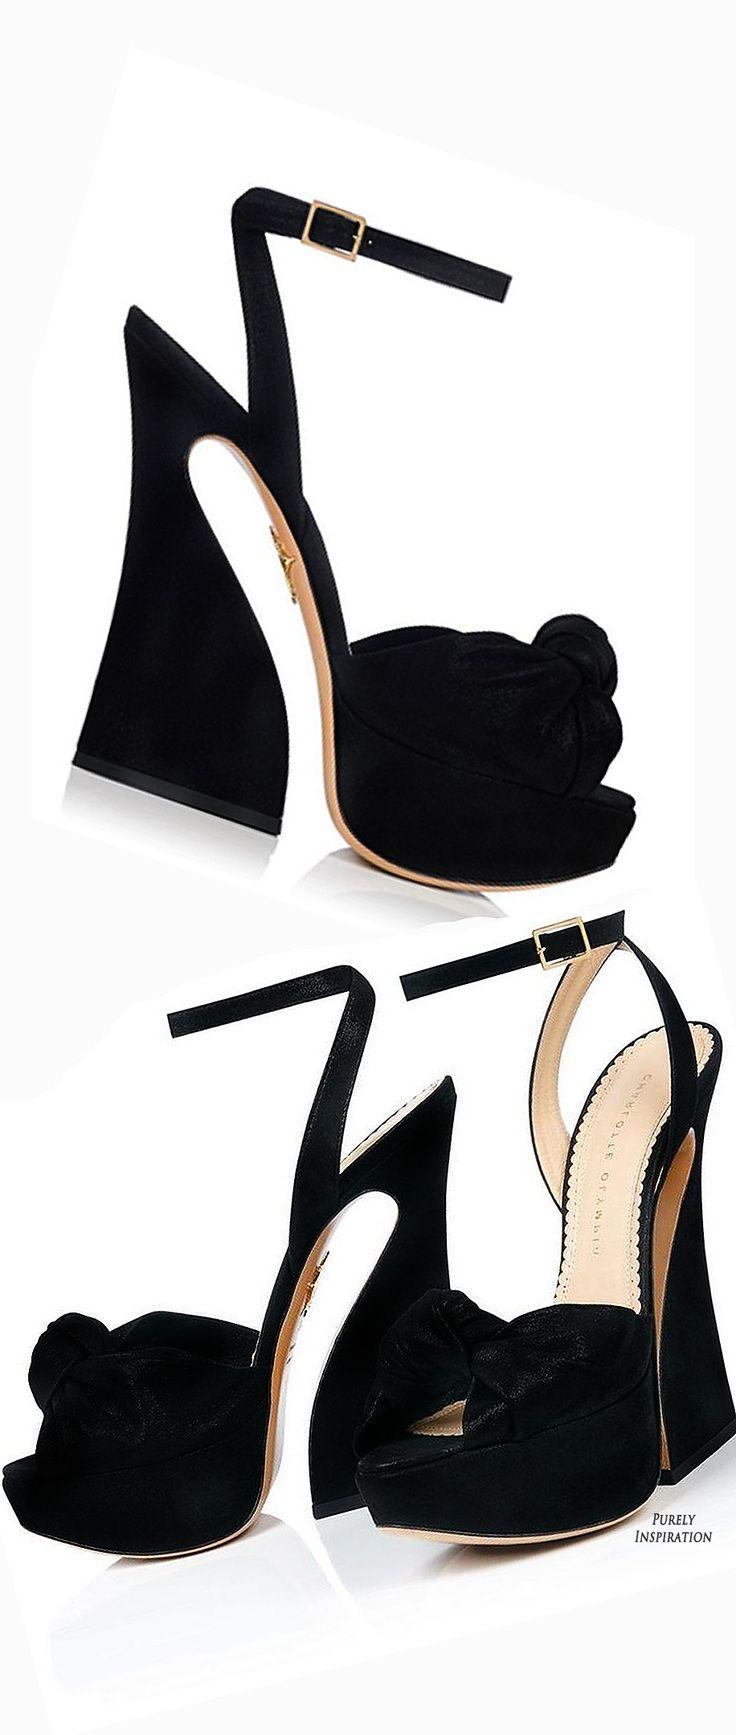 Charlotte Olympia Vreeland sandal | Purely Inspiration